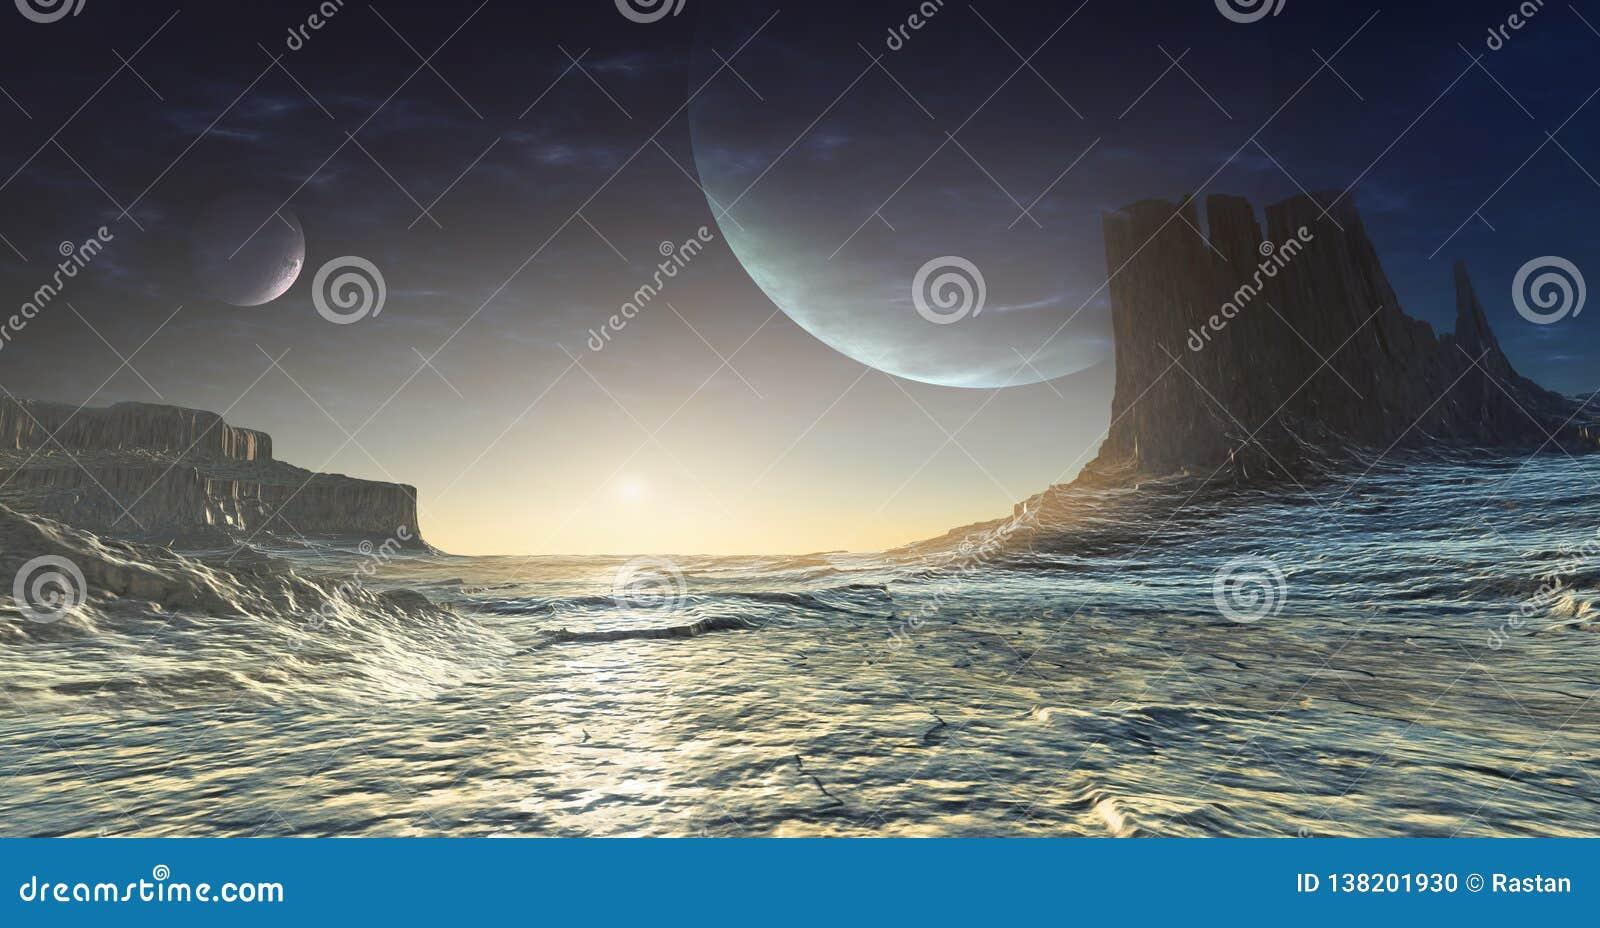 Lodowata obca planeta